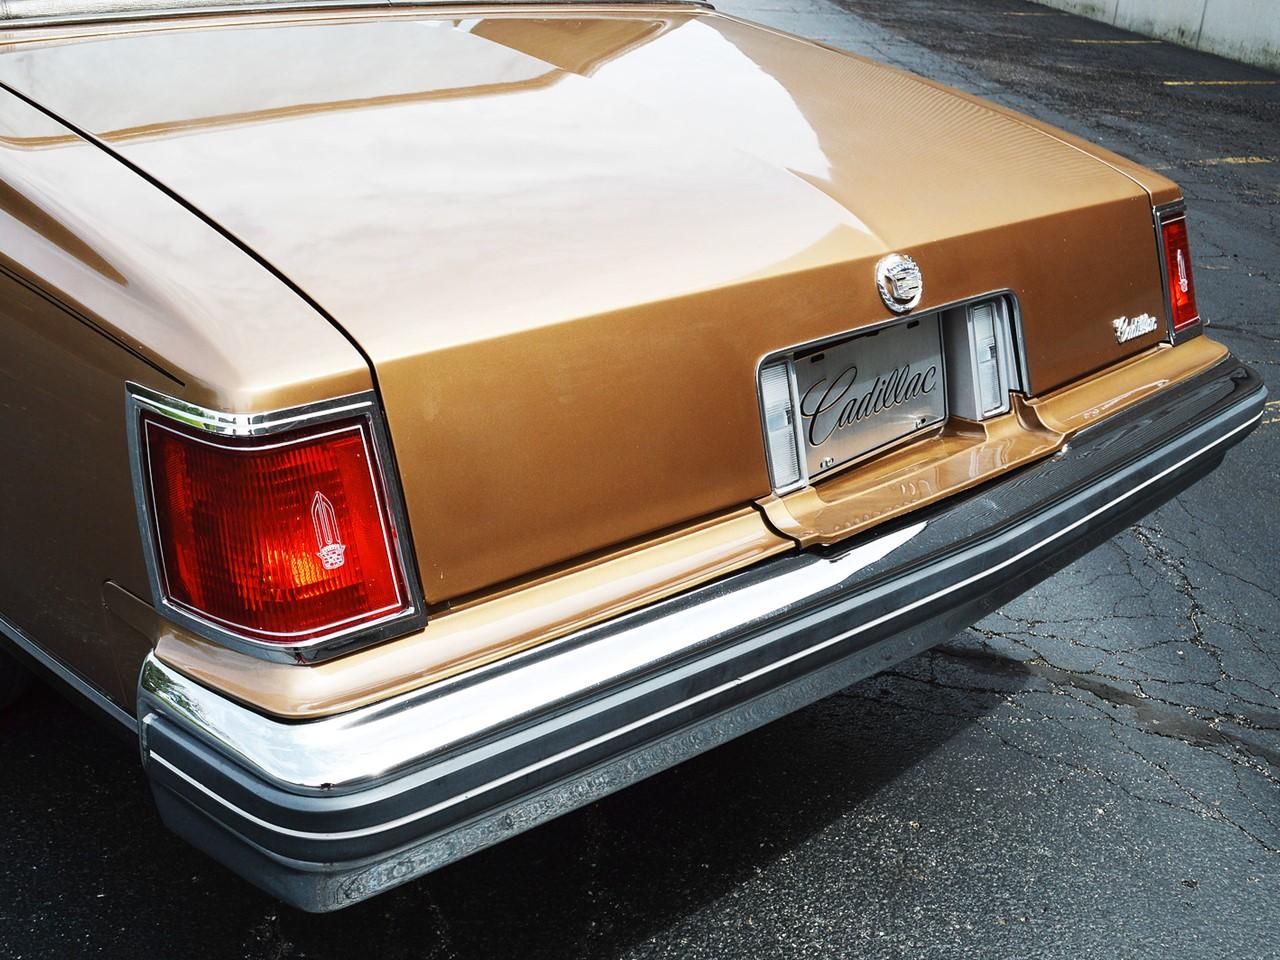 1976 Cadillac Seville 40